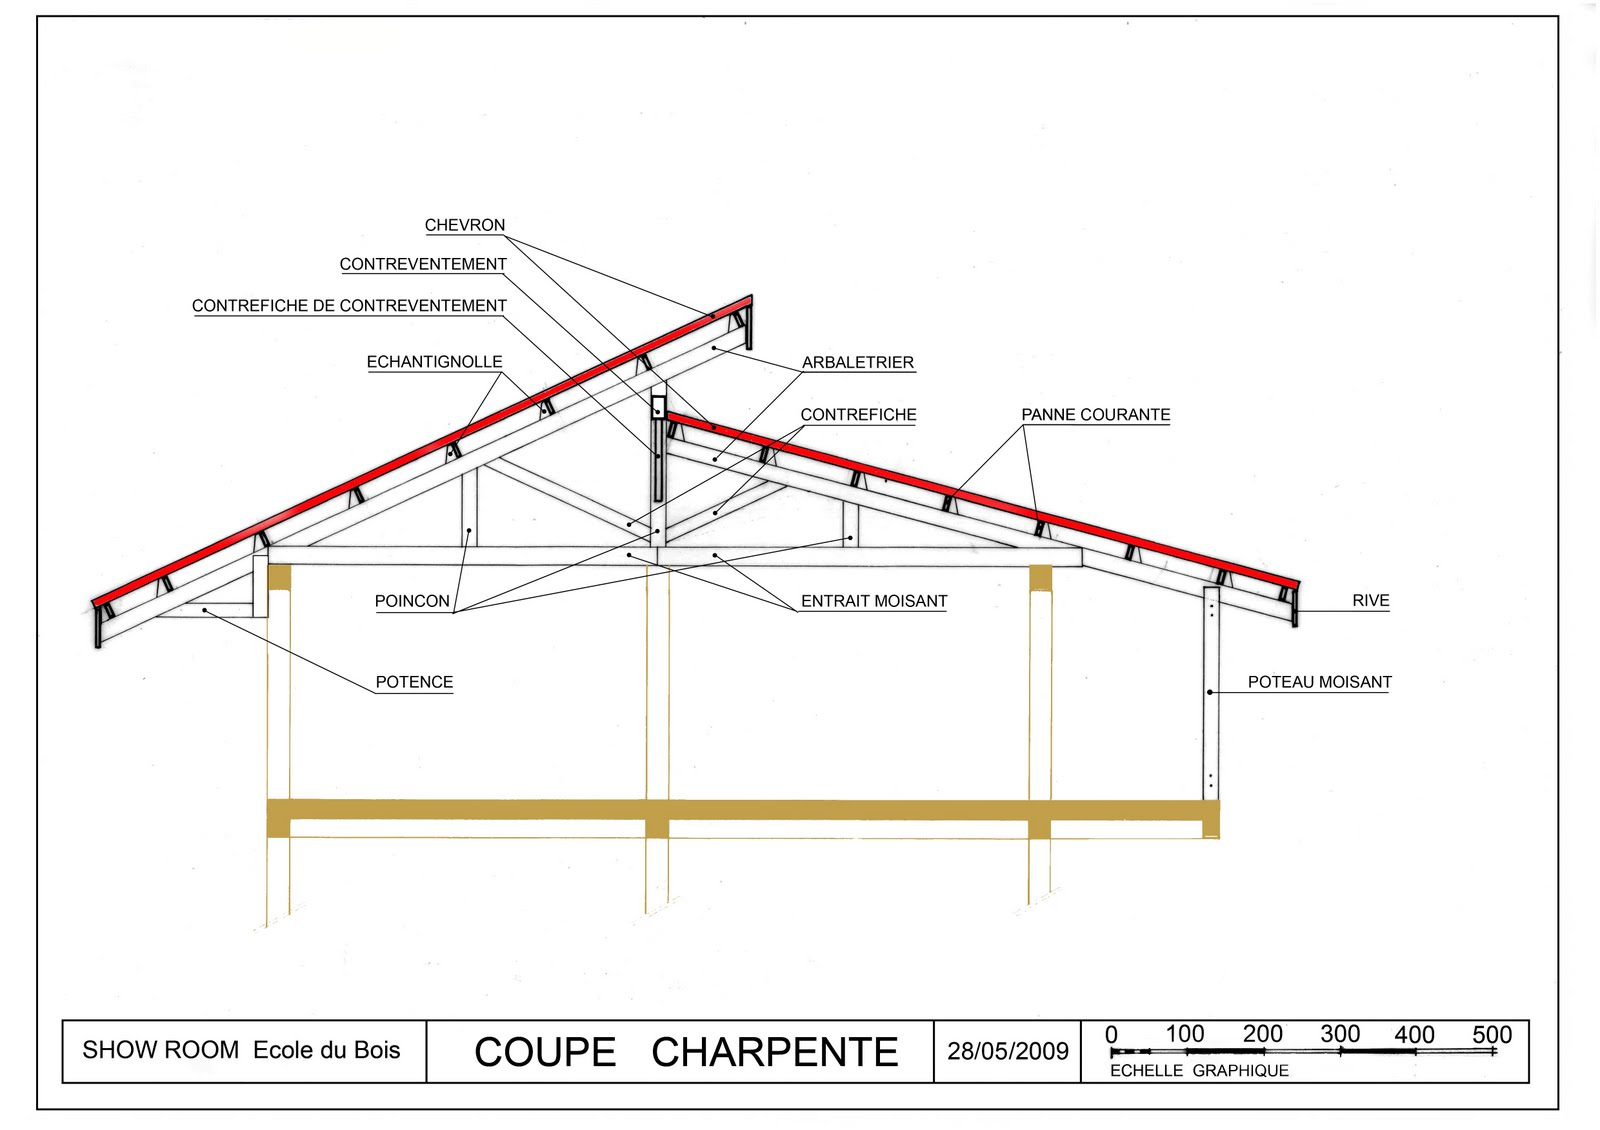 Carpentier Charpente Construction BOIS sarl